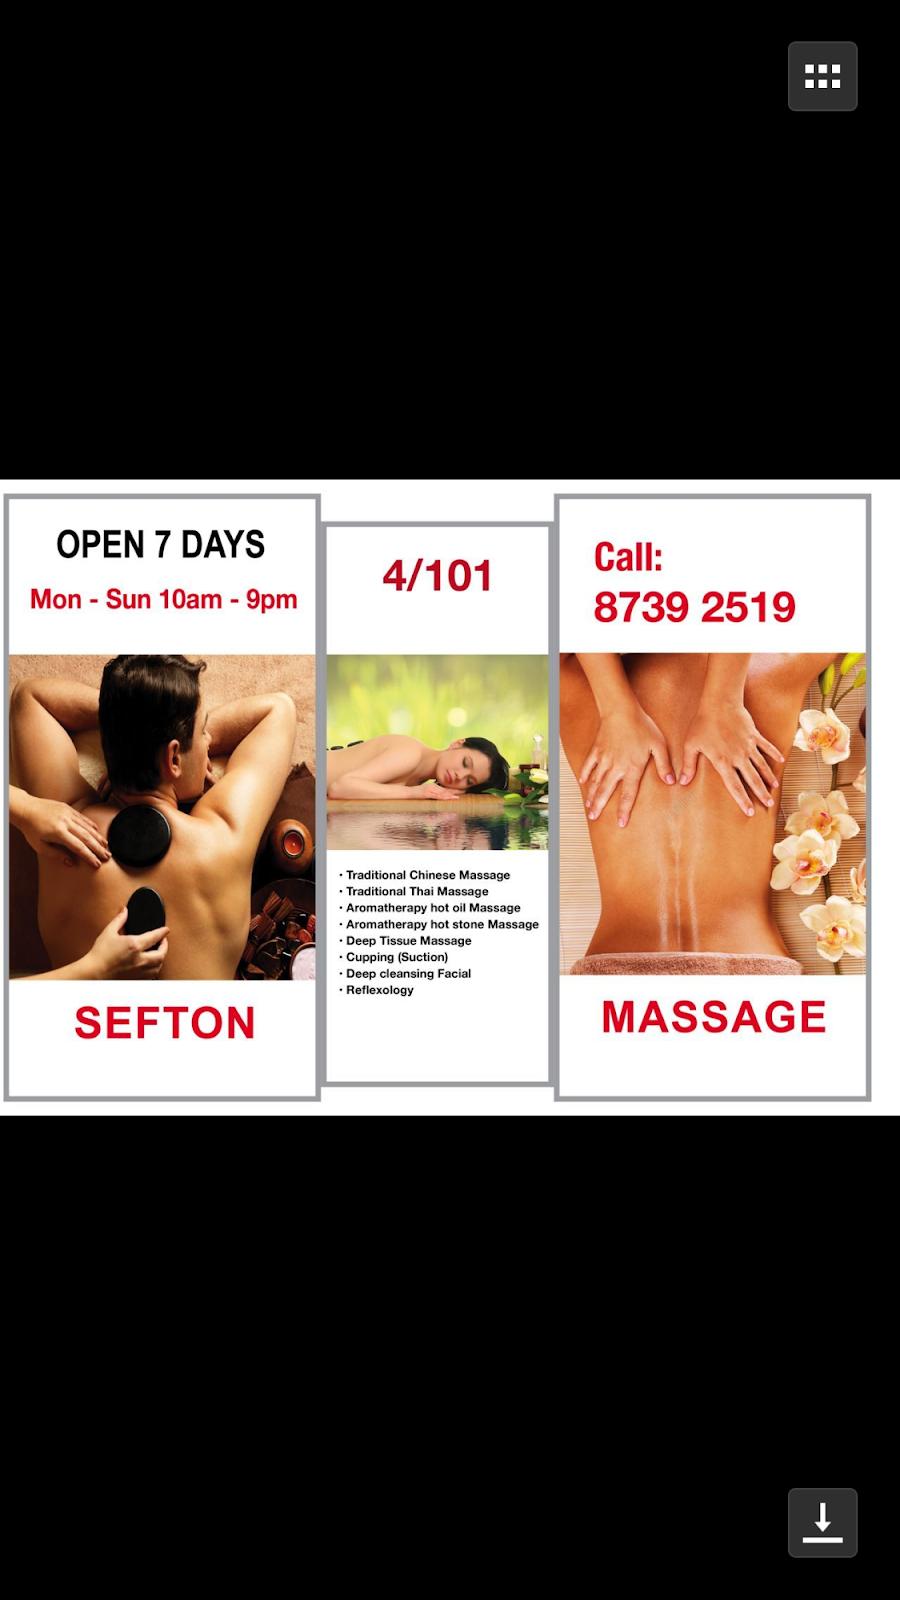 Sefton Massage Centre | spa | 4/101 Clapham Rd, Sefton NSW 2162, Australia | 0287392519 OR +61 2 8739 2519